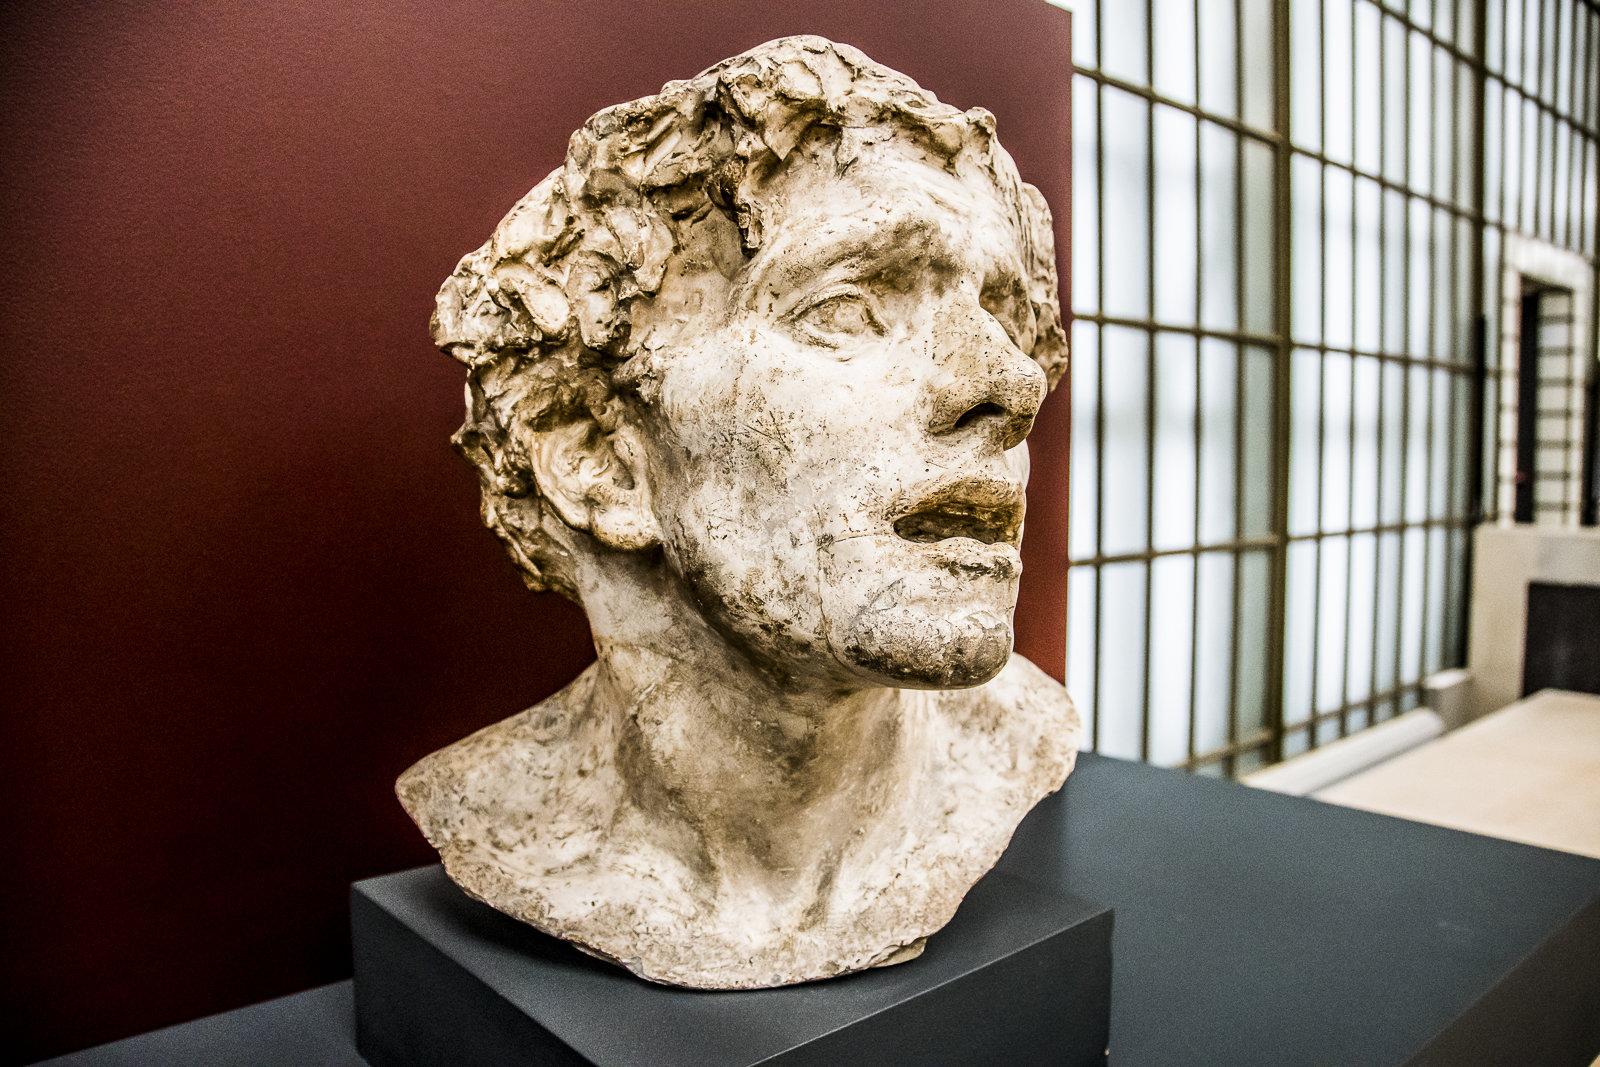 Bust at Musee d'Orsay